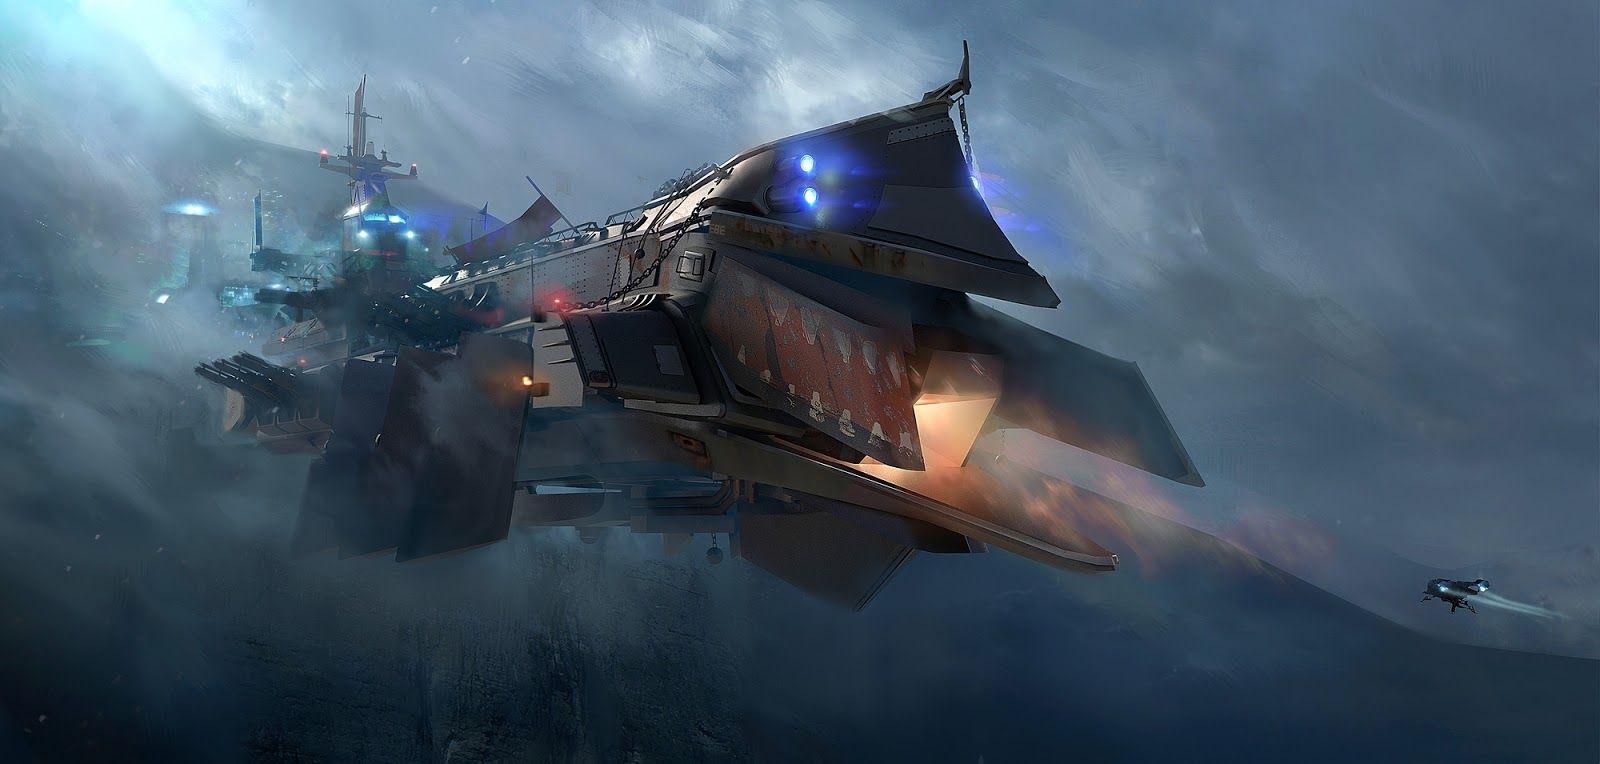 Pin On Space Spaceship Beyond good and evil 2 spaceship